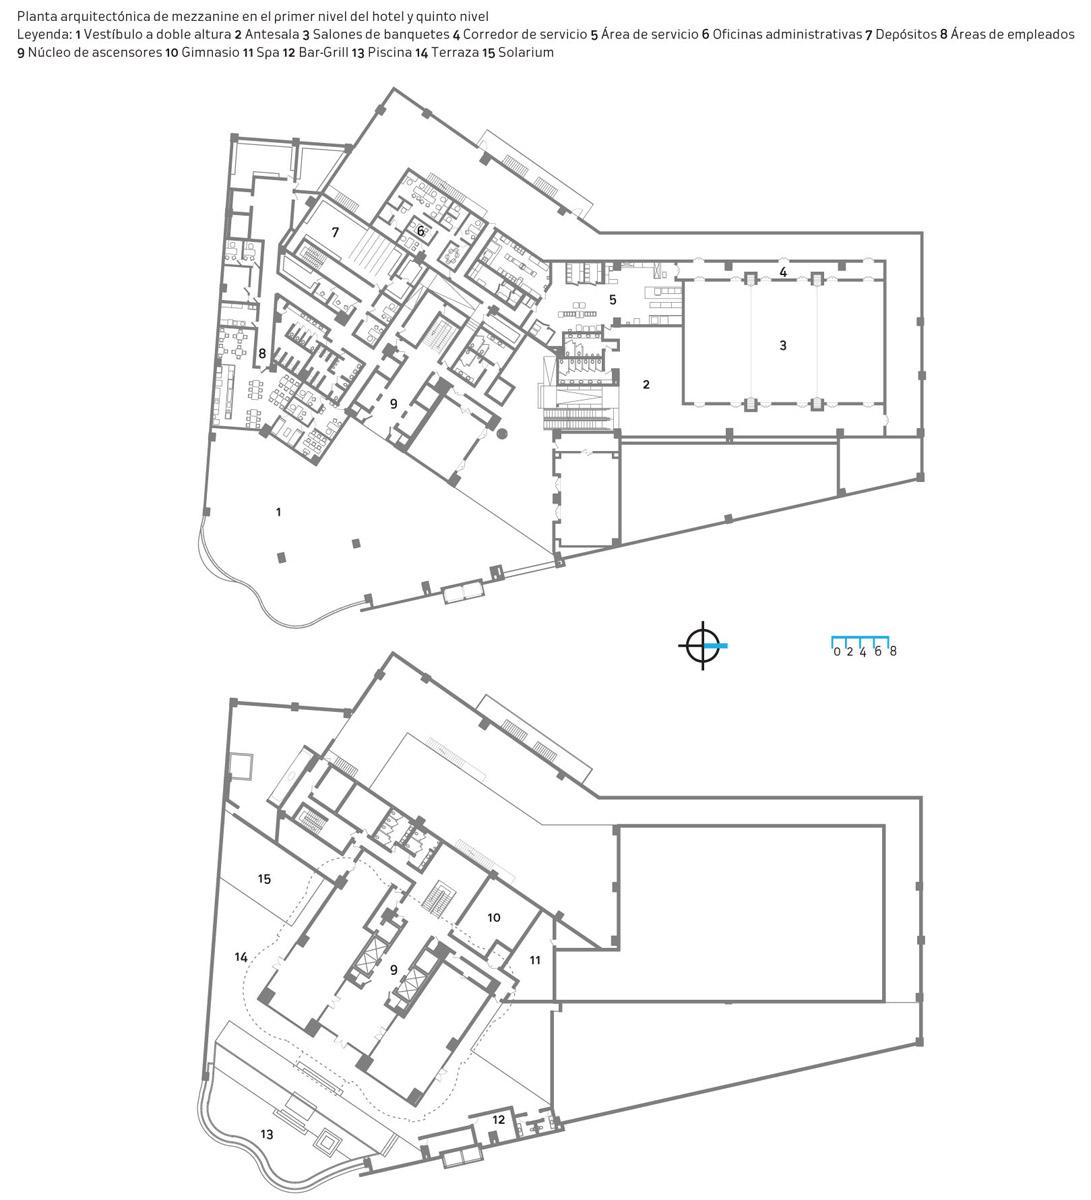 Embassy suites by hilton for Planta arquitectonica biblioteca